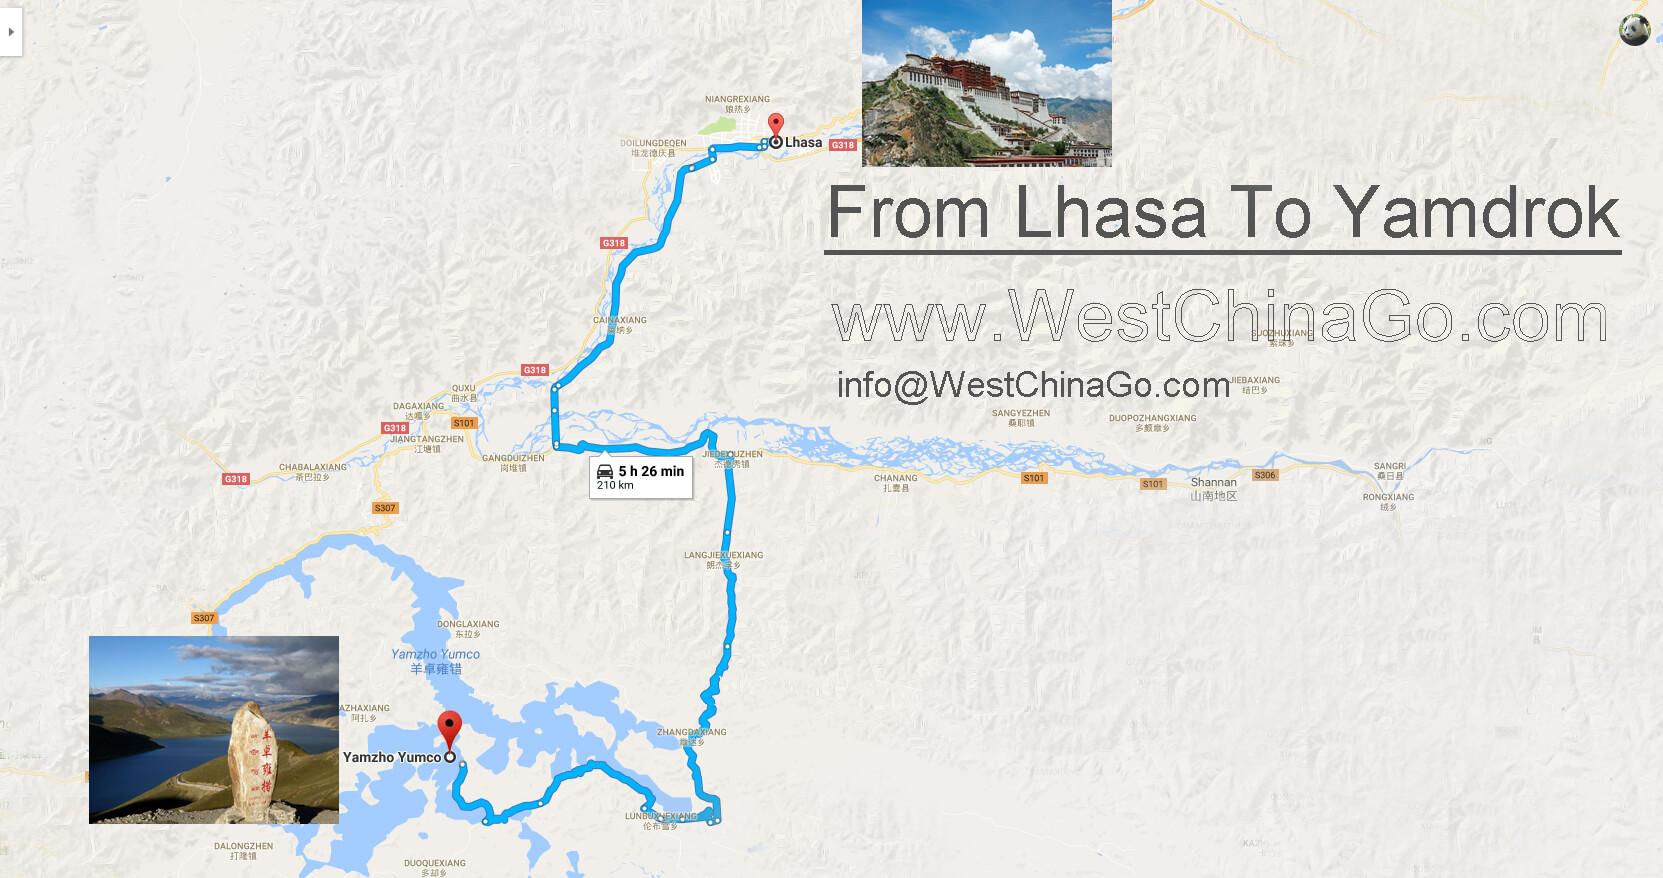 Lhasa China Map.Lhasa Tourist Map Archives China Chengdu Panda Holding Chengdu